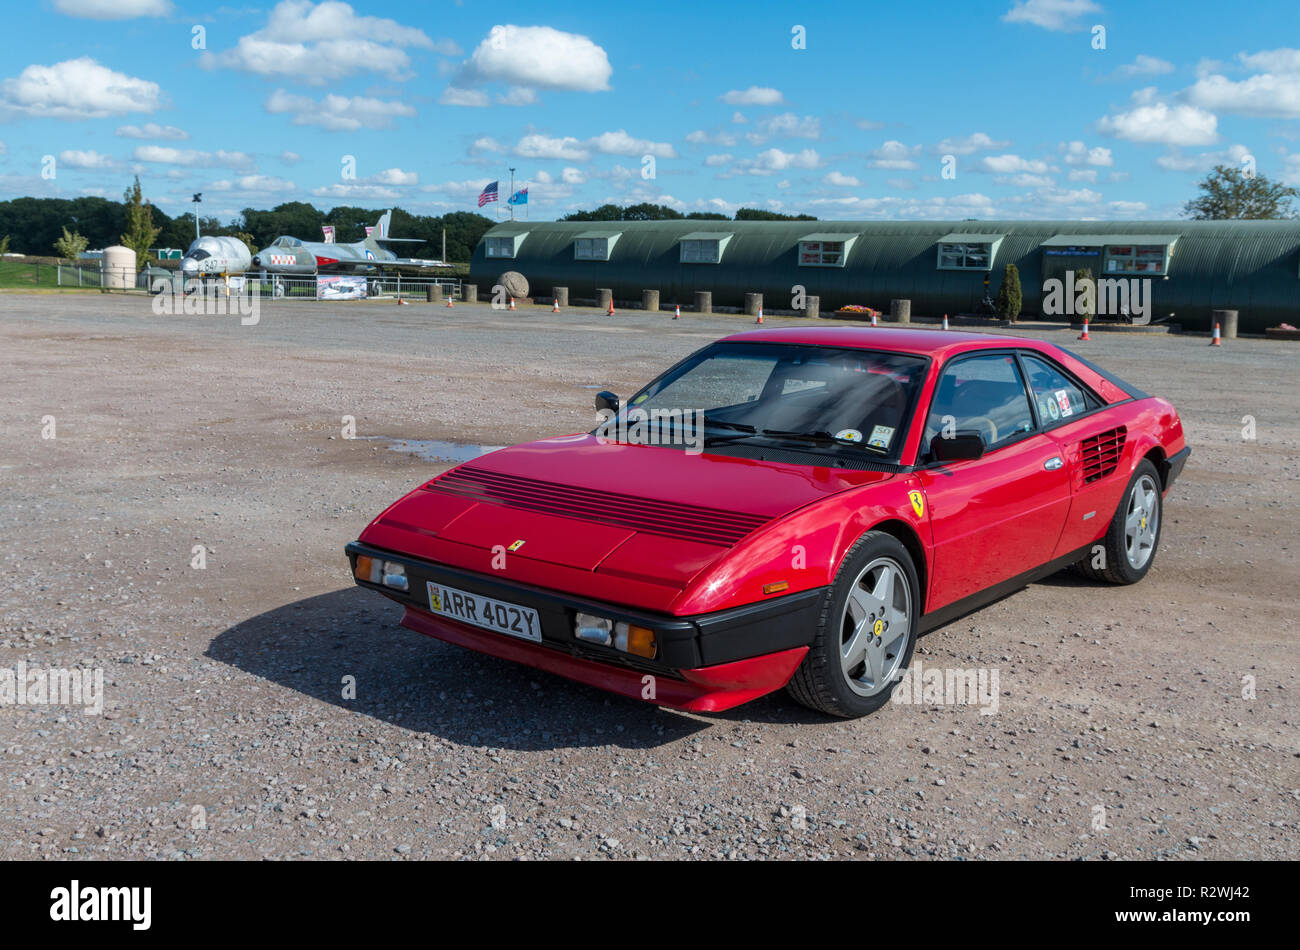 A red Ferrari Mondial, Quattrovalvole, Sywell Aerodrome, Northamptonshire, UK - Stock Image